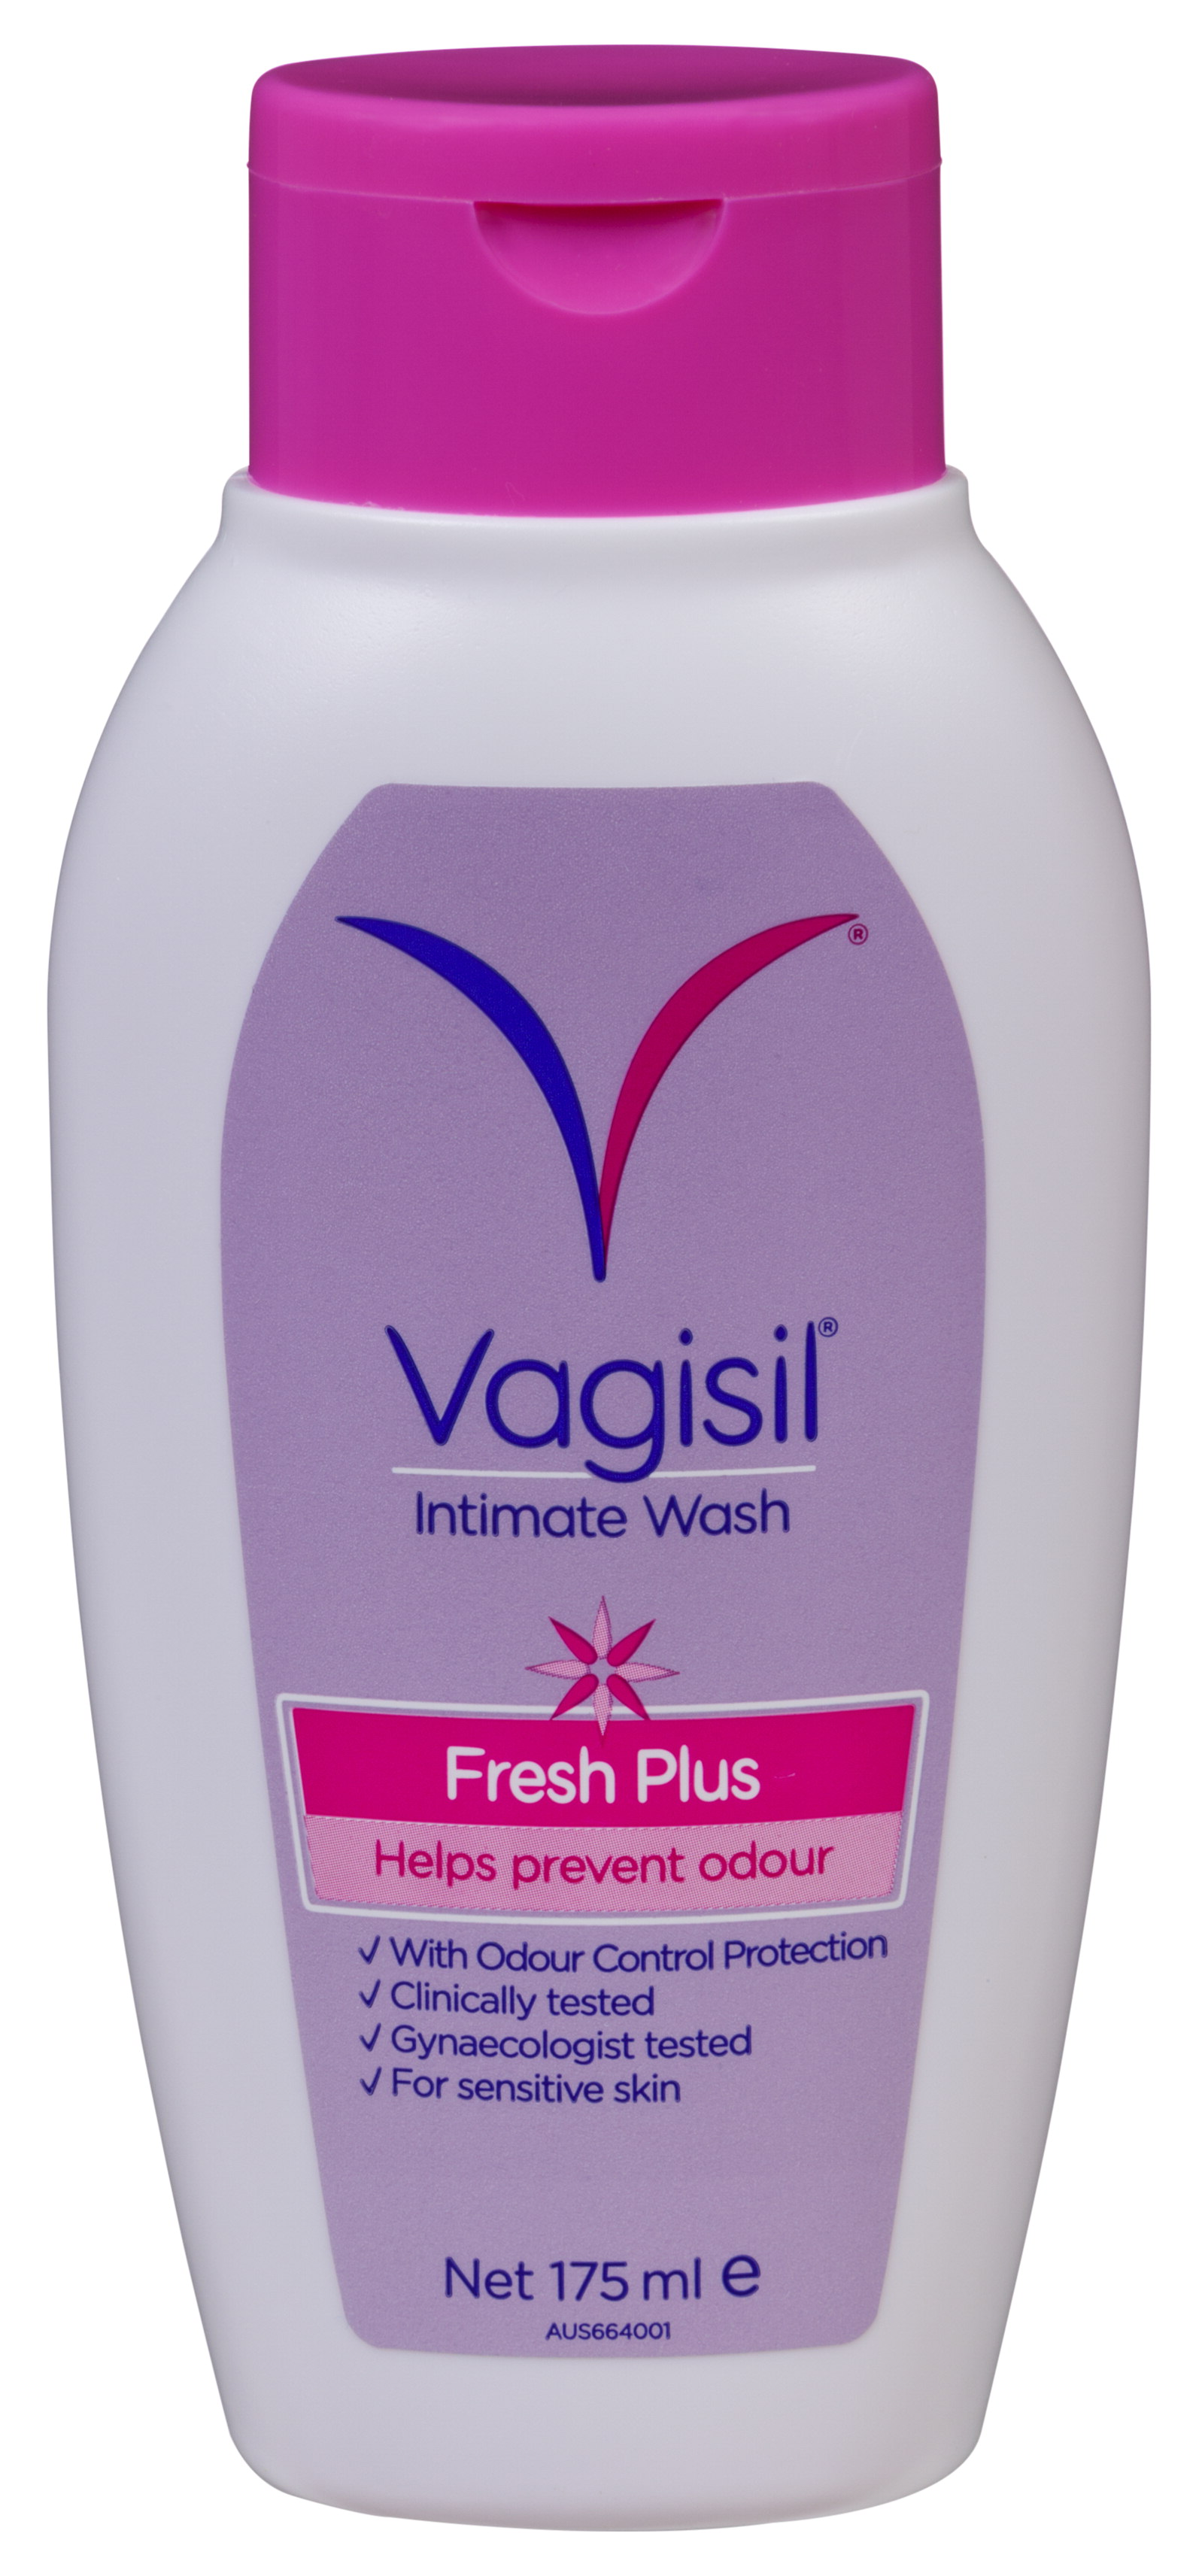 Buy Vagisil Feminine Wash 175ml At Health Chemist Online